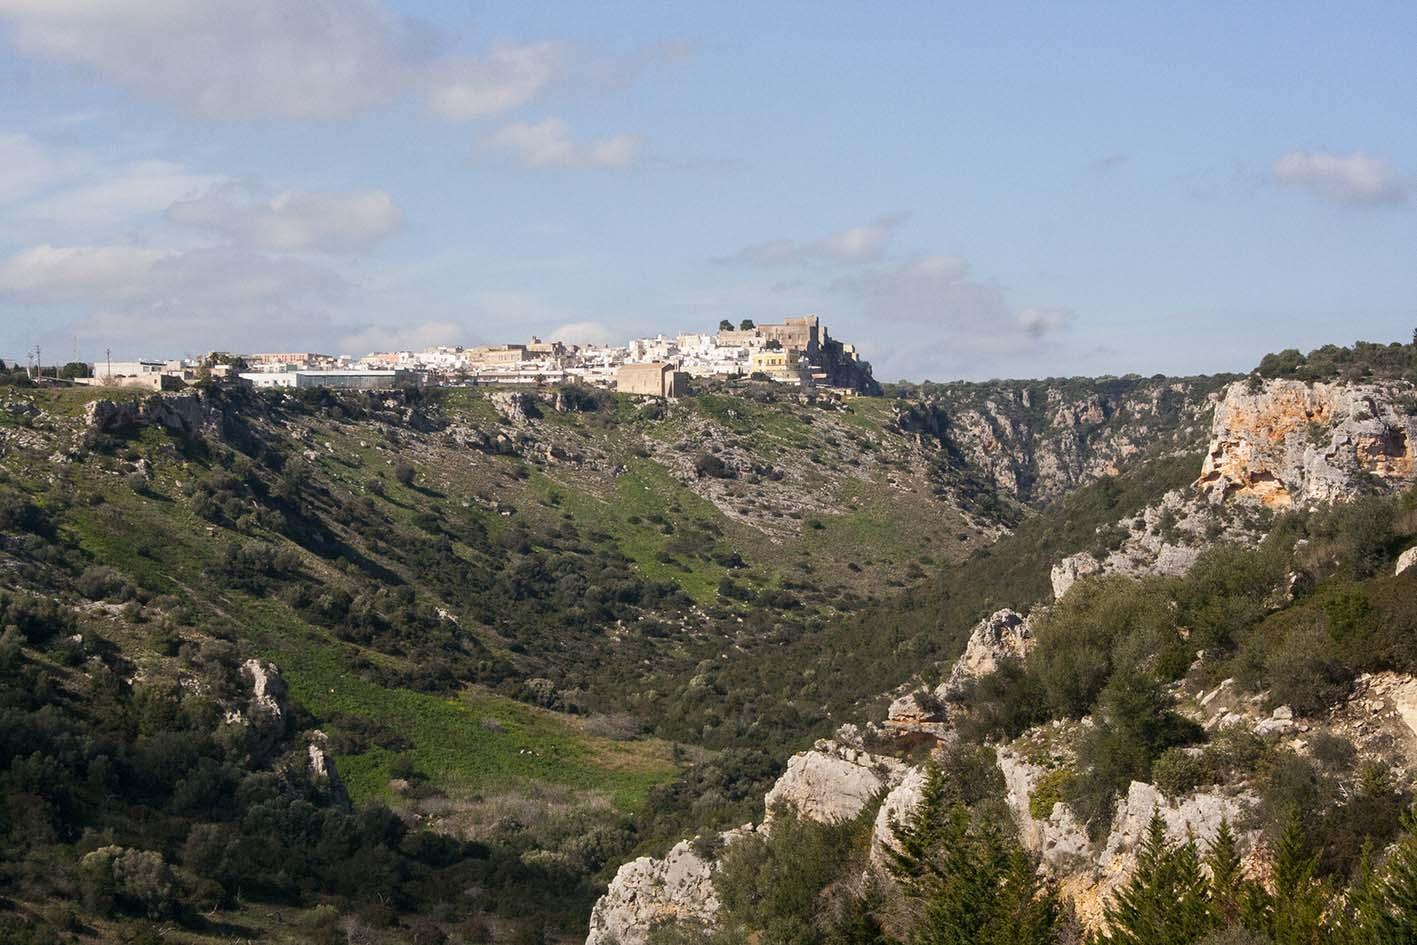 Gravina di Castellaneta, avventura in puglia, gravin, pingiovani, gravine, terra delle gravine